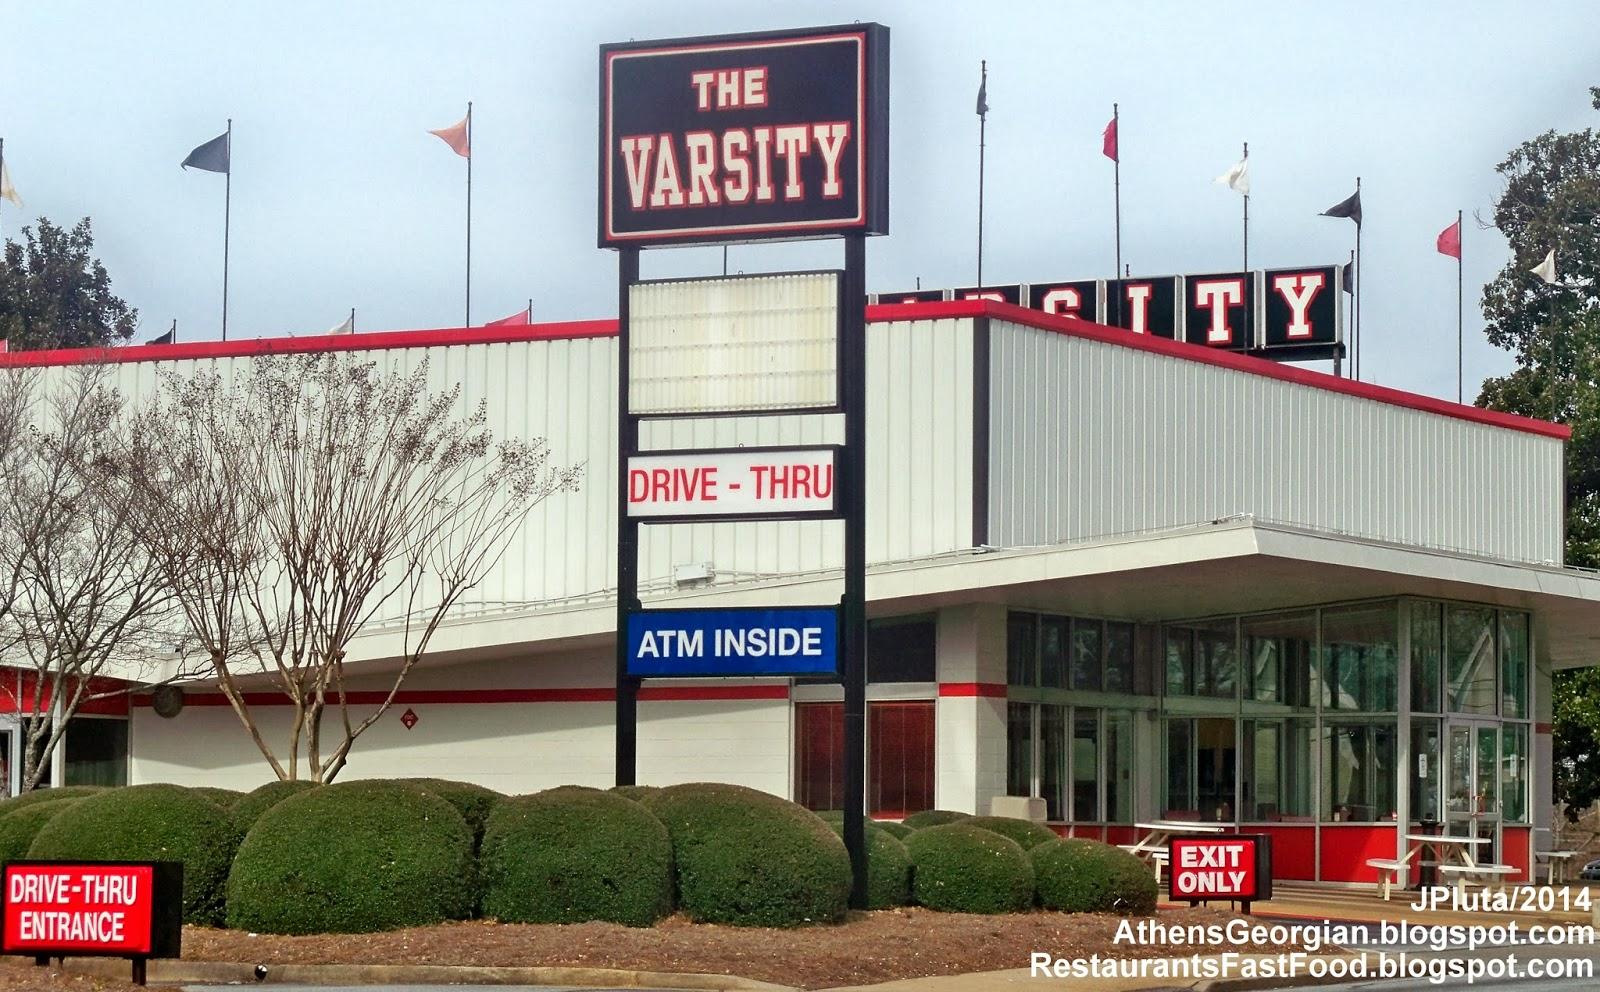 The Varsity Athens Georgia West Broad Street At Milledge Ave Menu Hot Dog Wiener Fast Food Restaurant Ga